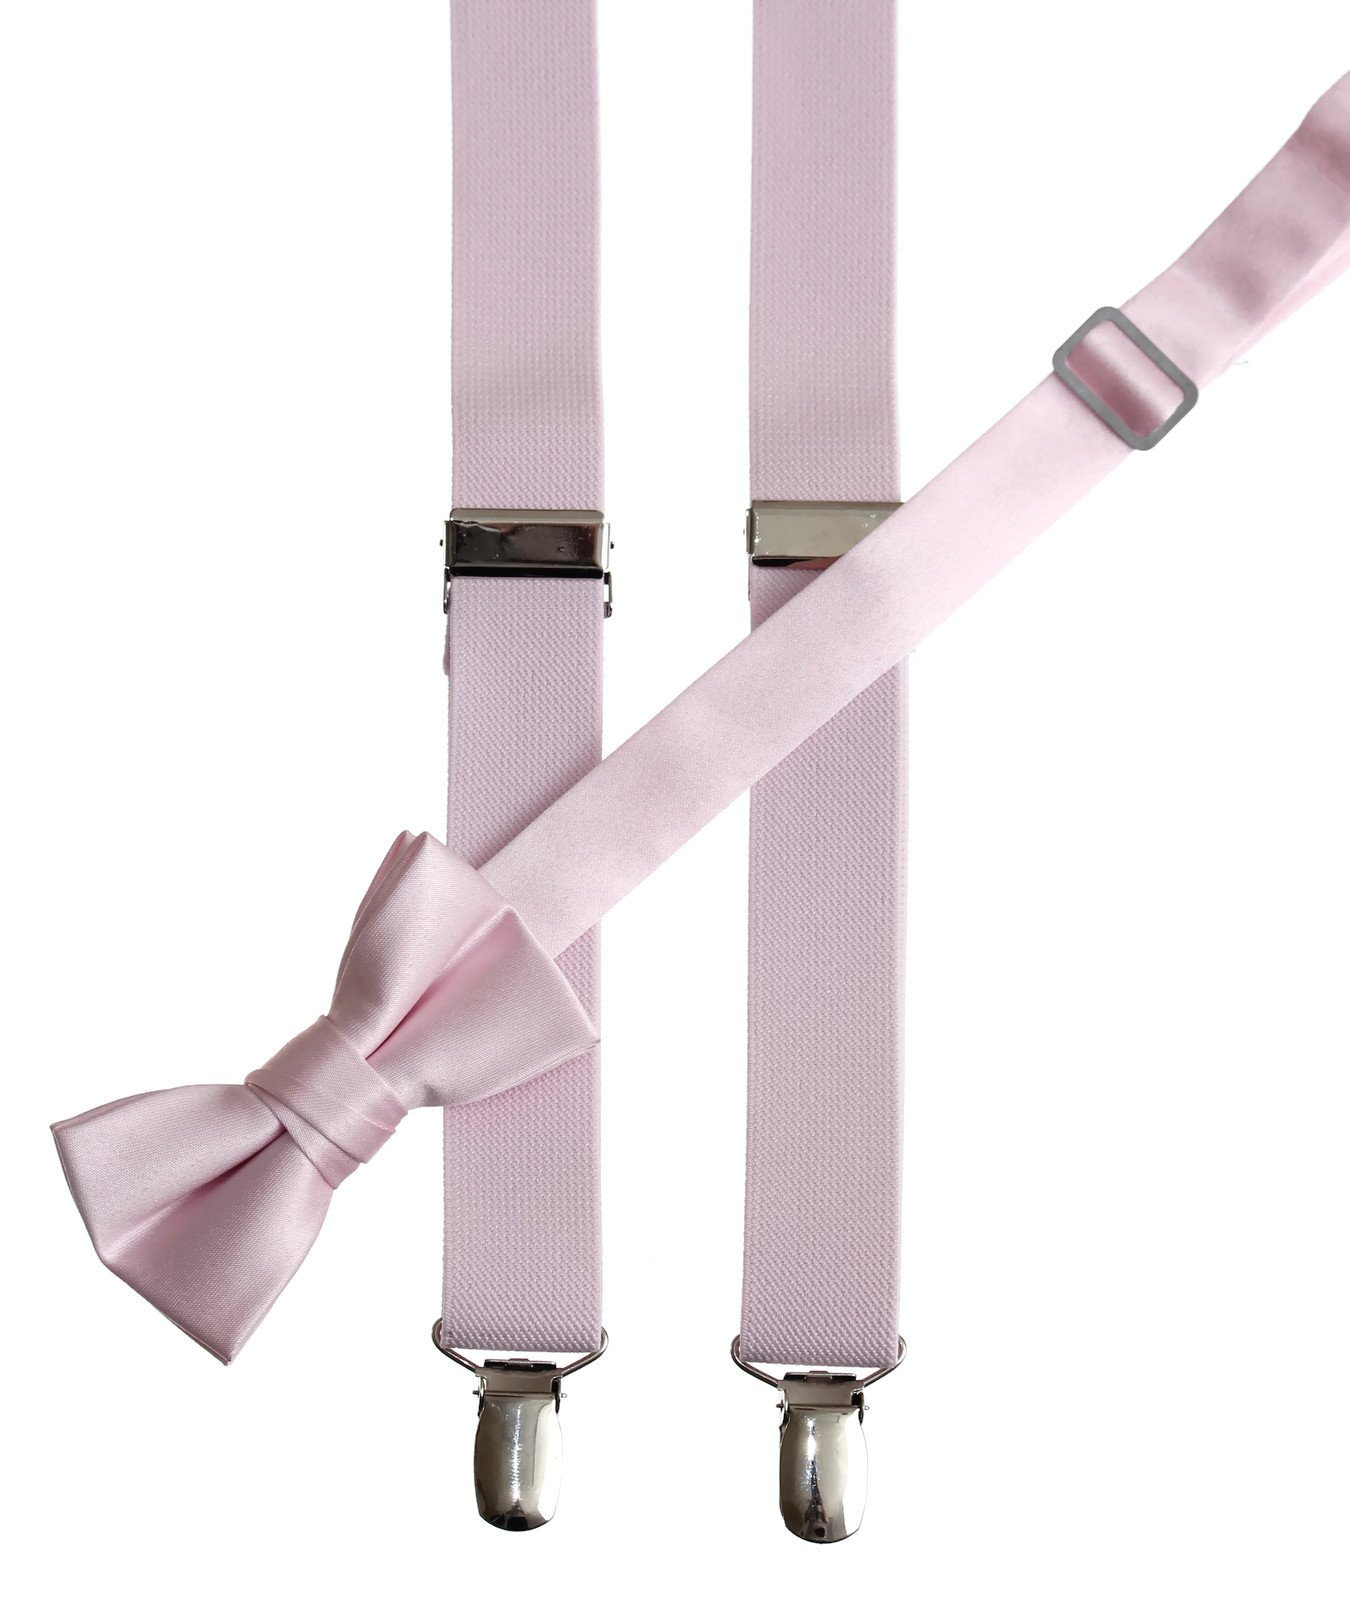 Kids Light Pink Adjustable Suspender and Bow Tie Set, Fits on Average Ages 4-7